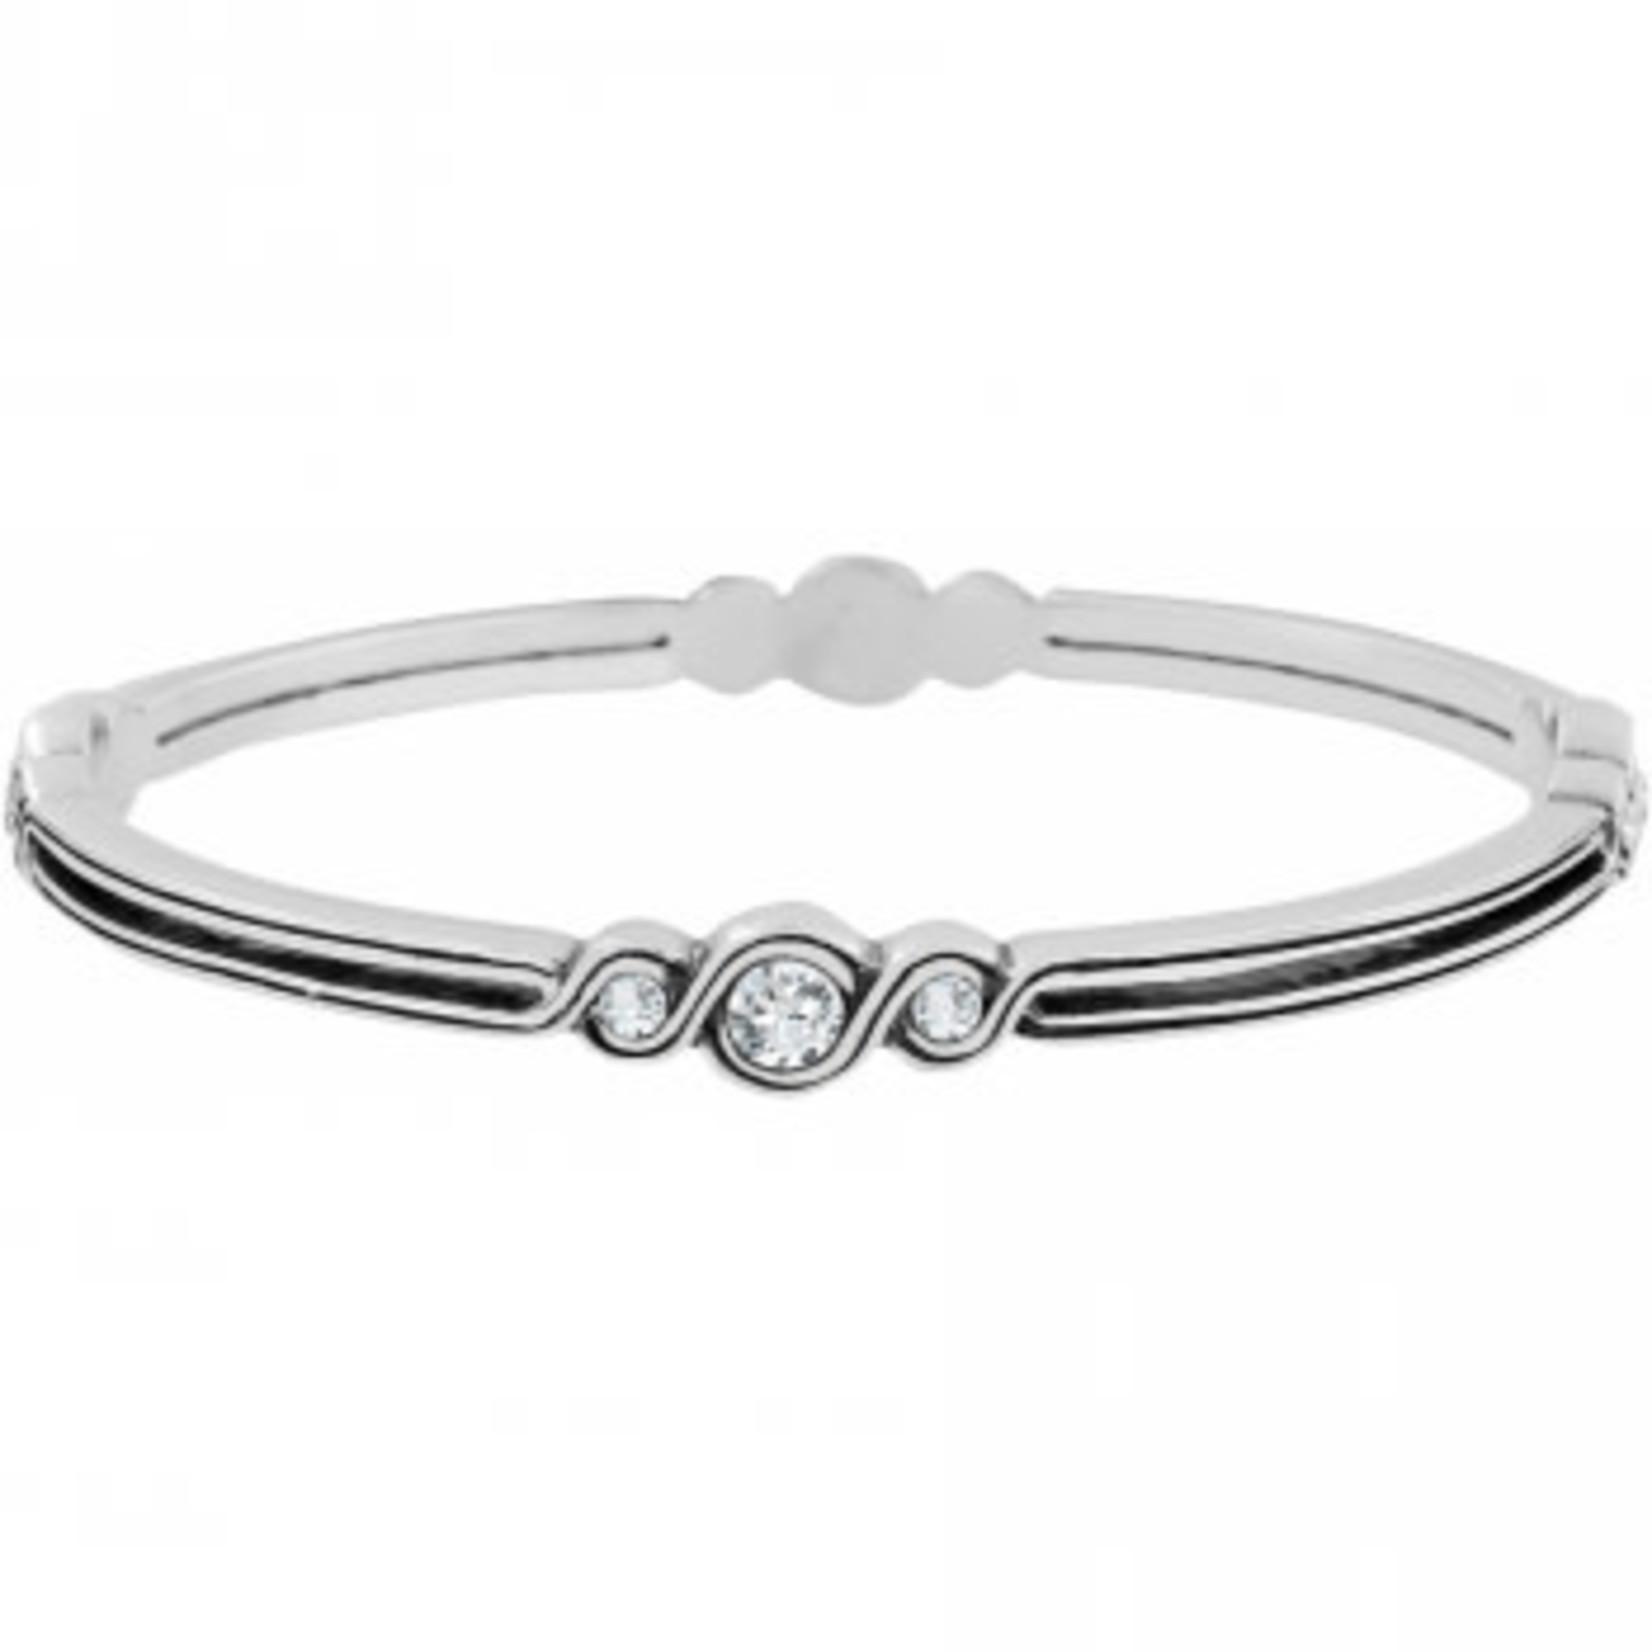 Brighton Infinity Sparkle Bangle Bracelet